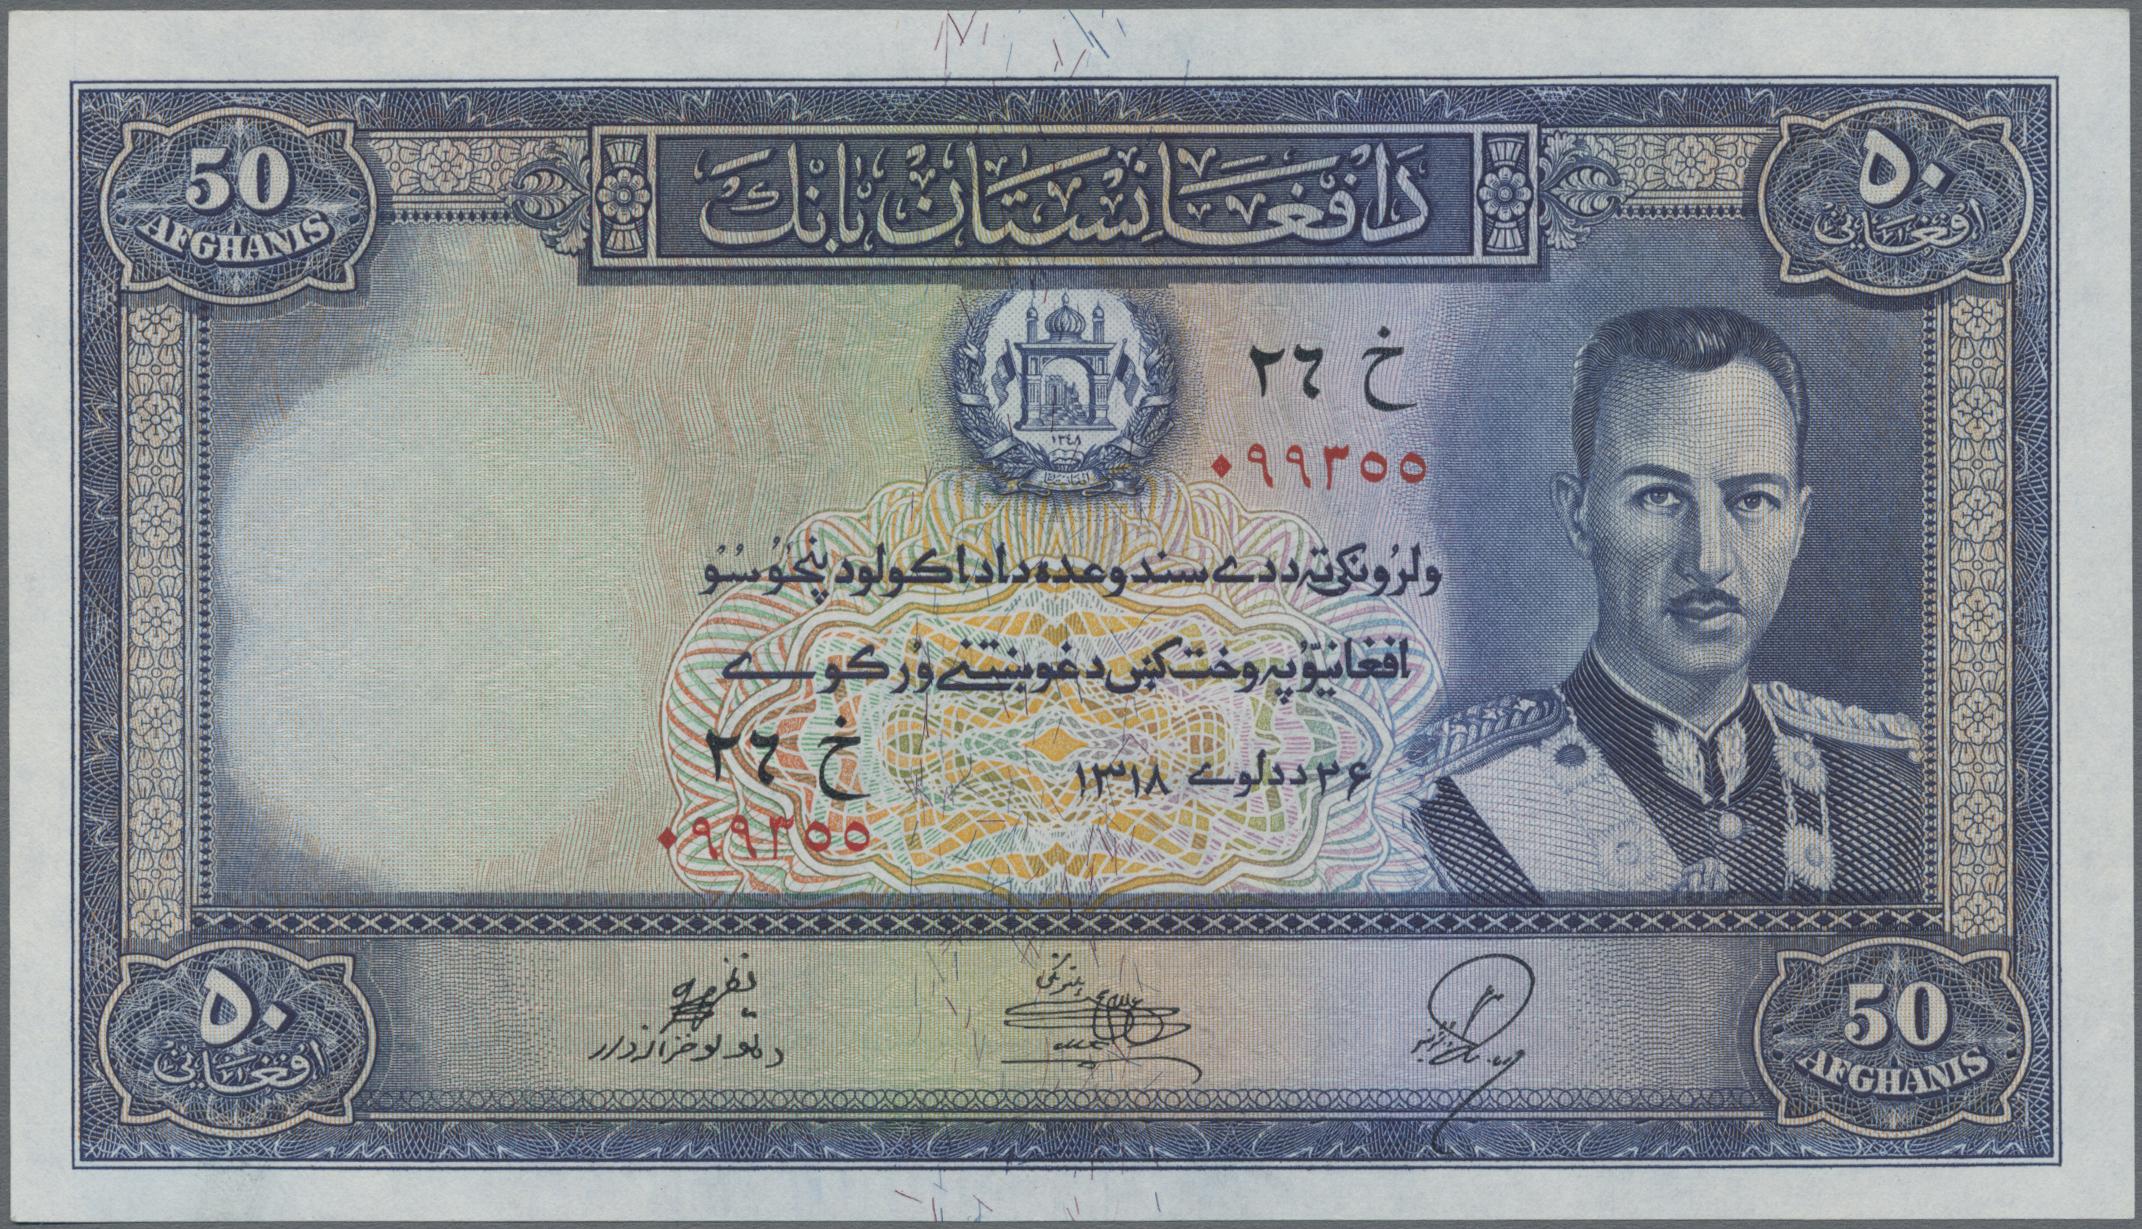 Lot 00001 - Afghanistan | Banknoten  -  Auktionshaus Christoph Gärtner GmbH & Co. KG Sale #48 The Banknotes